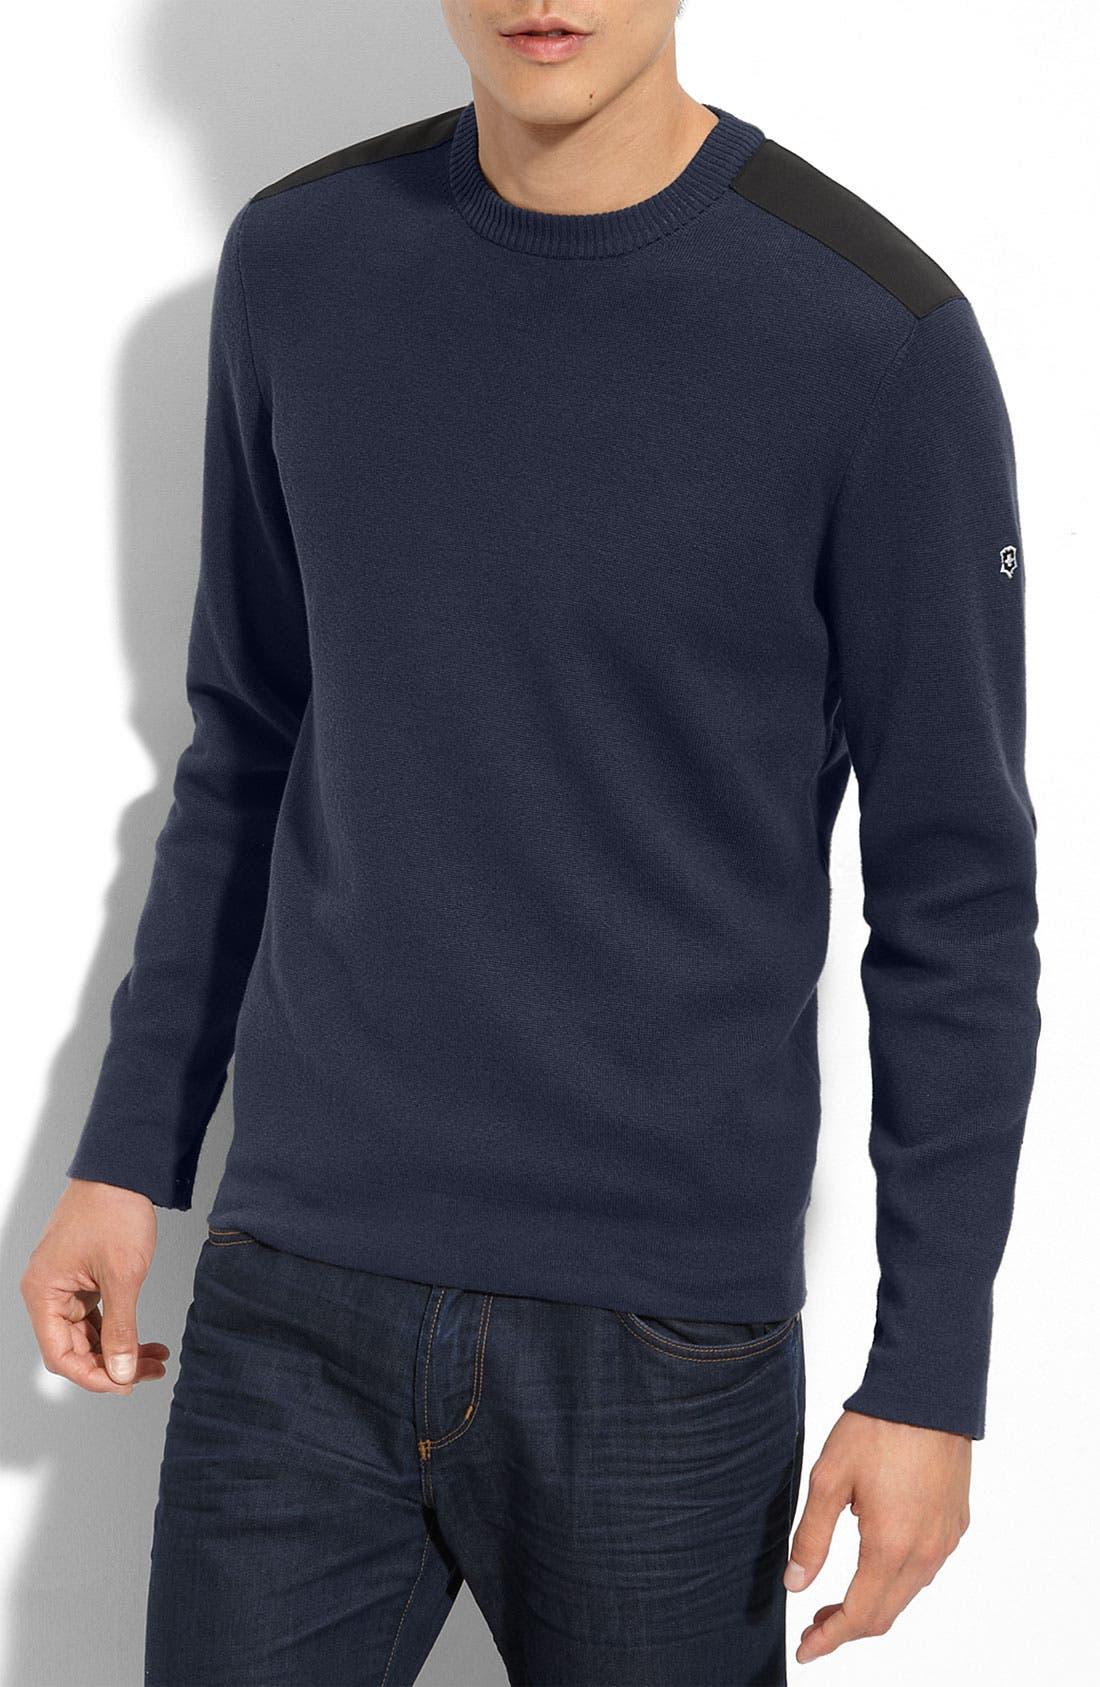 Main Image - Victorinox Swiss Army® 'Sleaford' Crewneck Sweater (Online Exclusive)